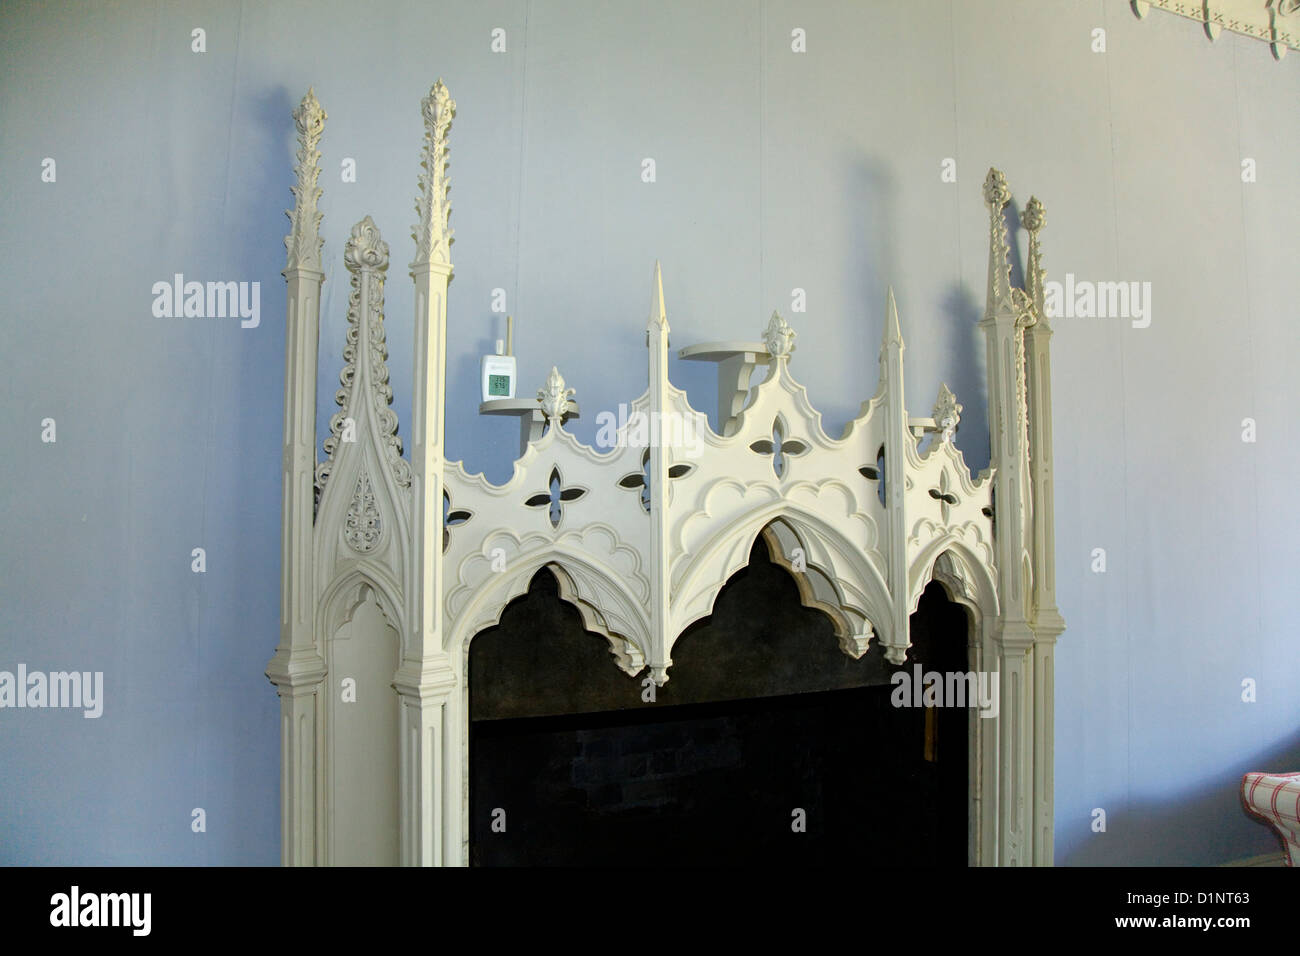 Gothic chimney / mantle piece / chimneypiece / mantlepiece of restored Strawberry Hill House, Twickenham. Middlesex. UK. Stock Photo